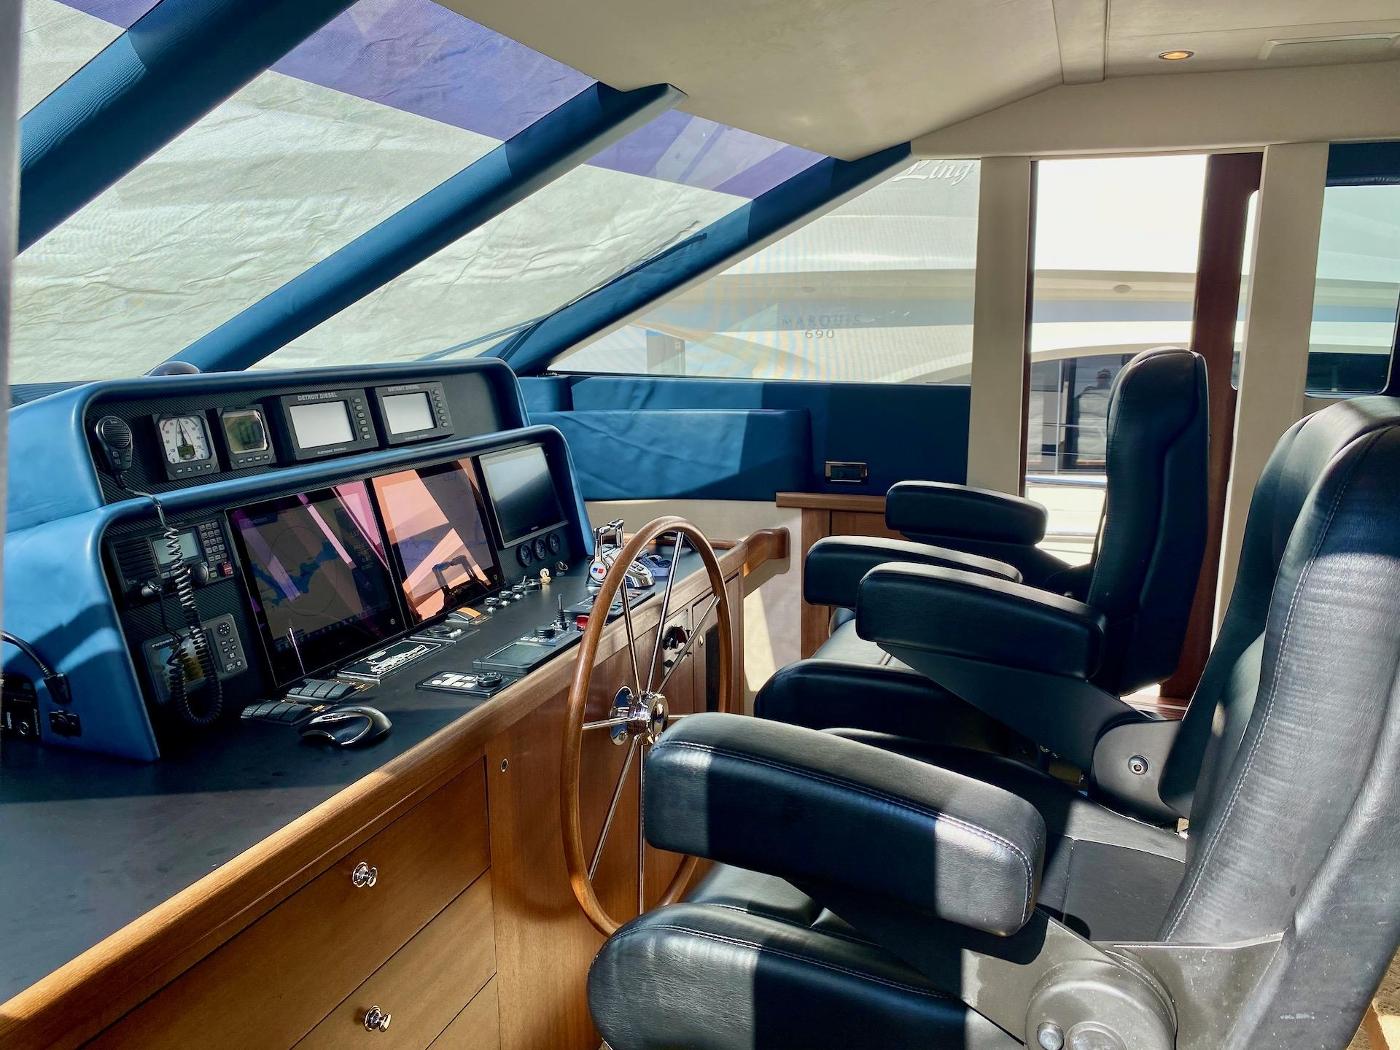 2004 Pacific Mariner 65 Diamond, Pilothouse helm